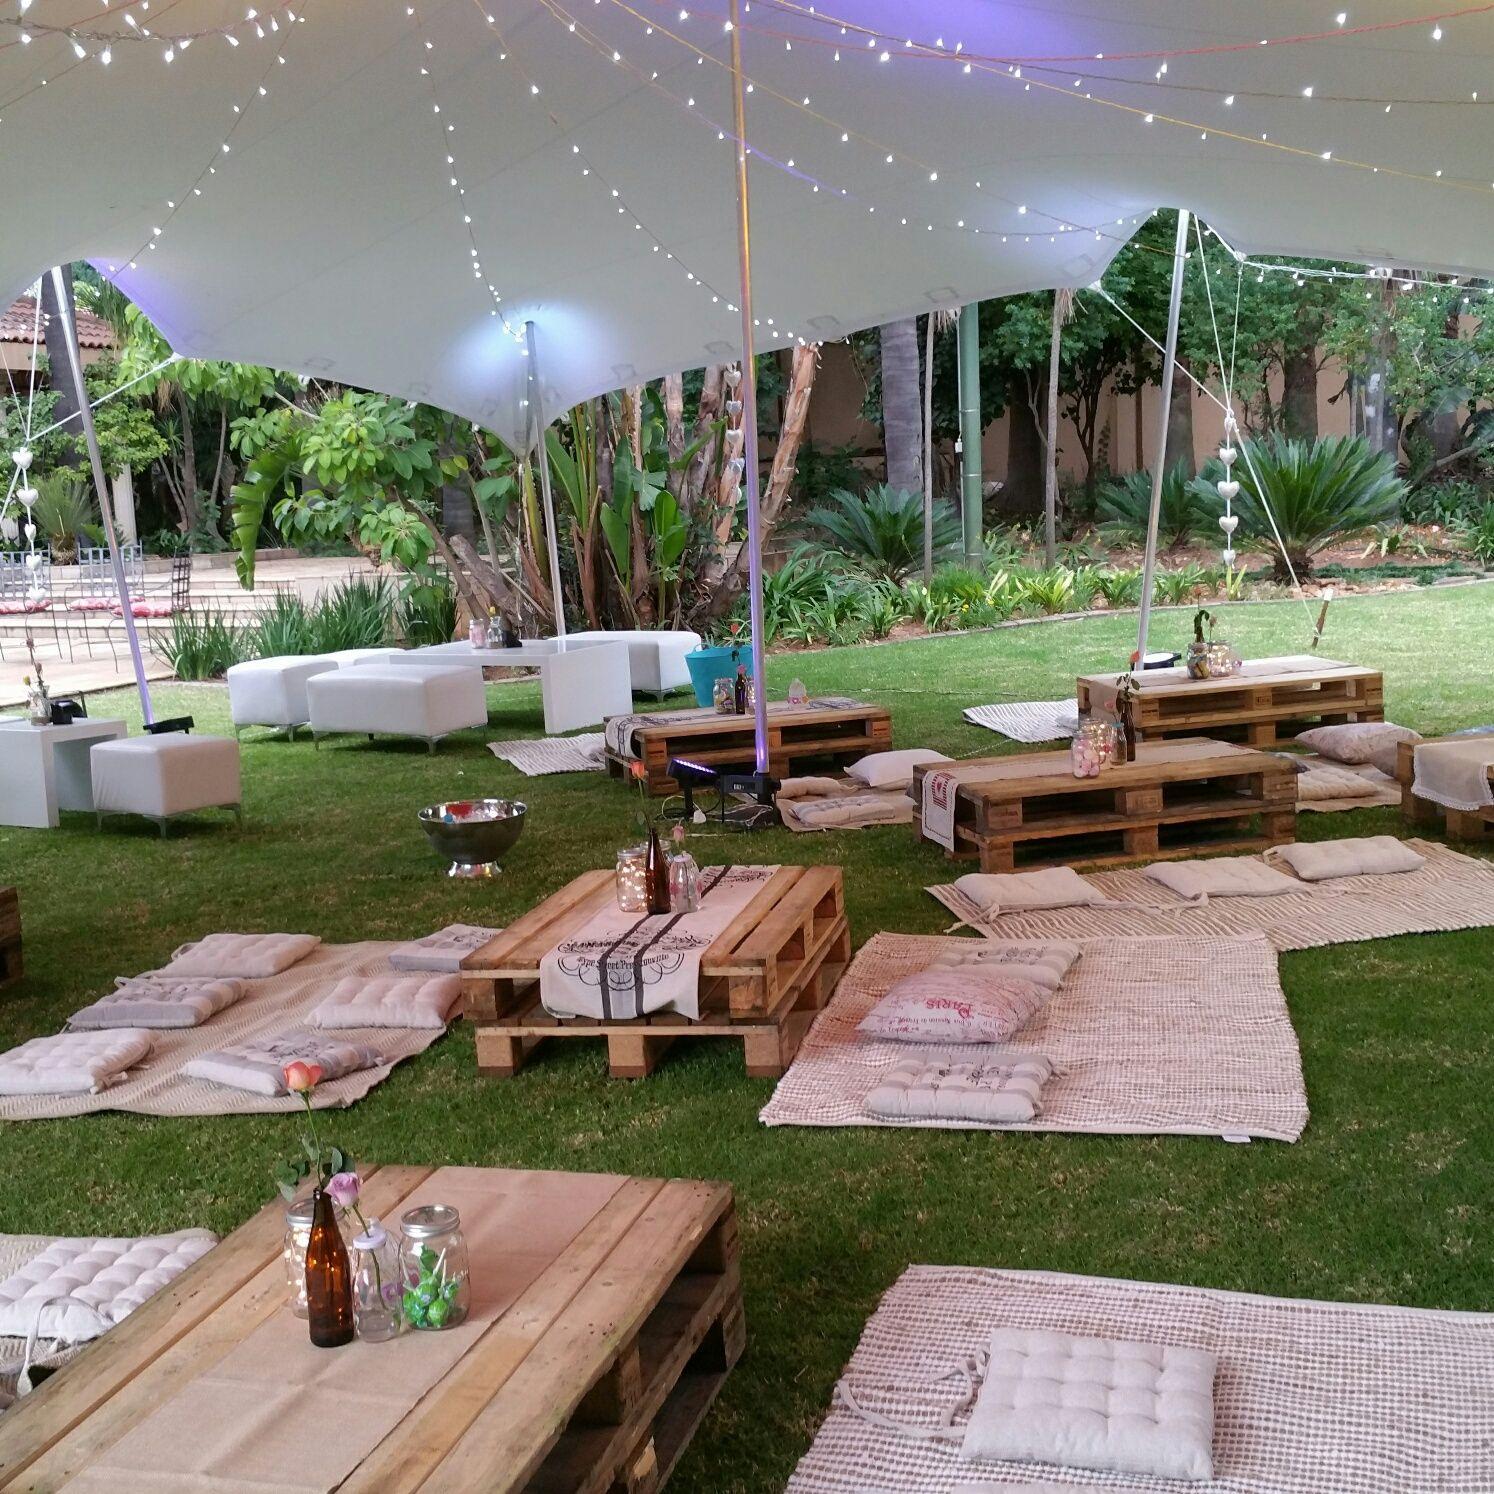 outdoor garden party ideas festival decor ideas - Google Search | Tenting in 2019